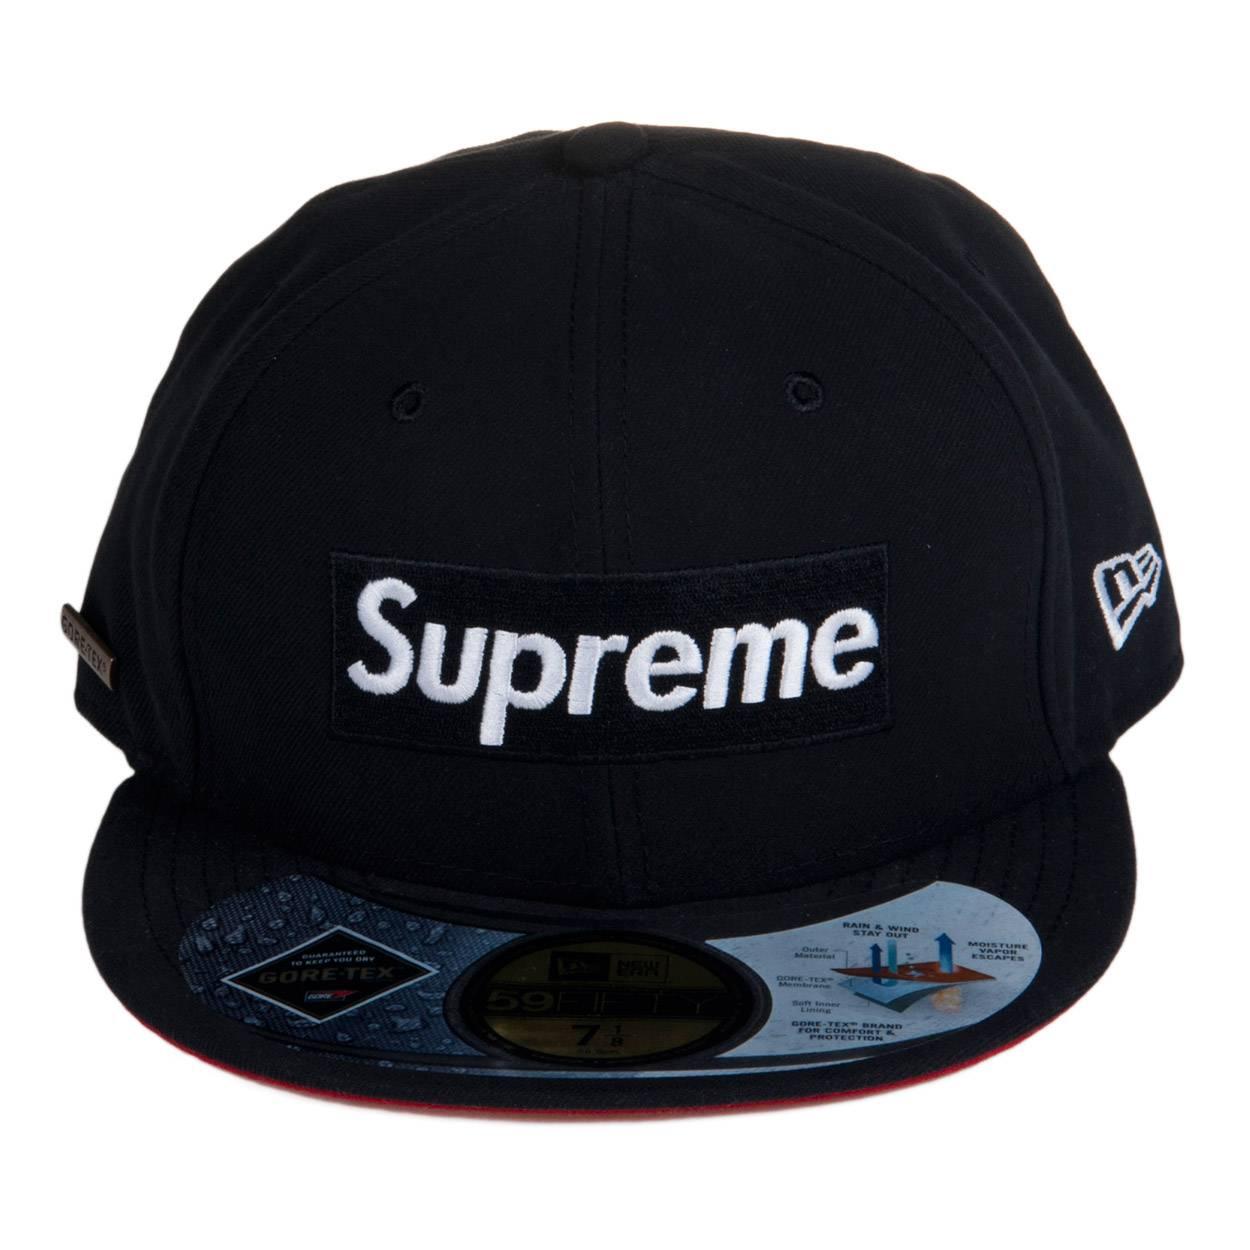 999f35c0a00 Supreme x New Era Gore-Tex Box Logo